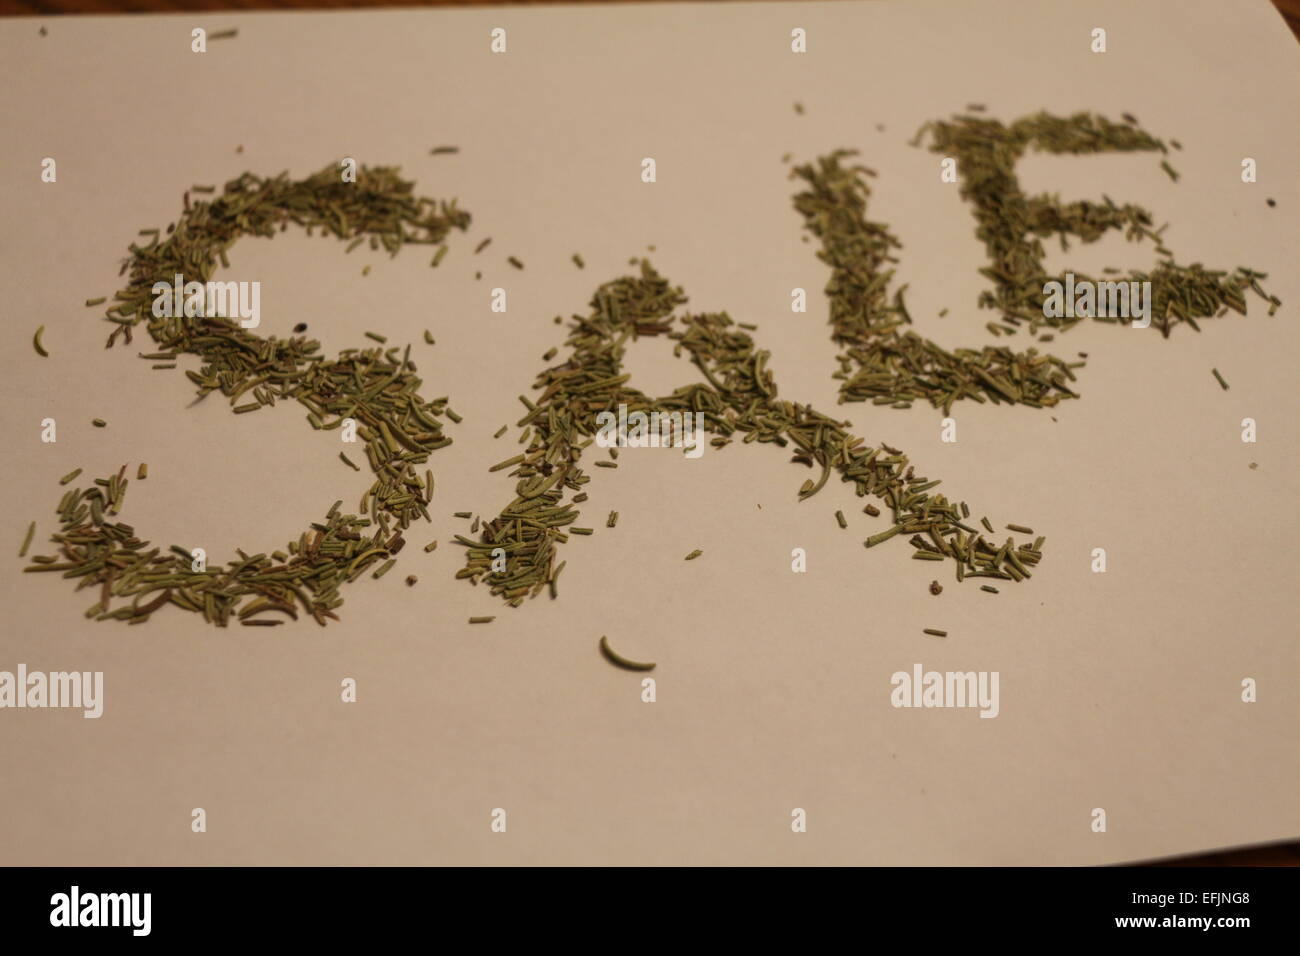 a sale sign,a sale poster , item on sale,sales,product sale,store sale,product sale,store sale,1;art;artwork;artworks;business - Stock Image